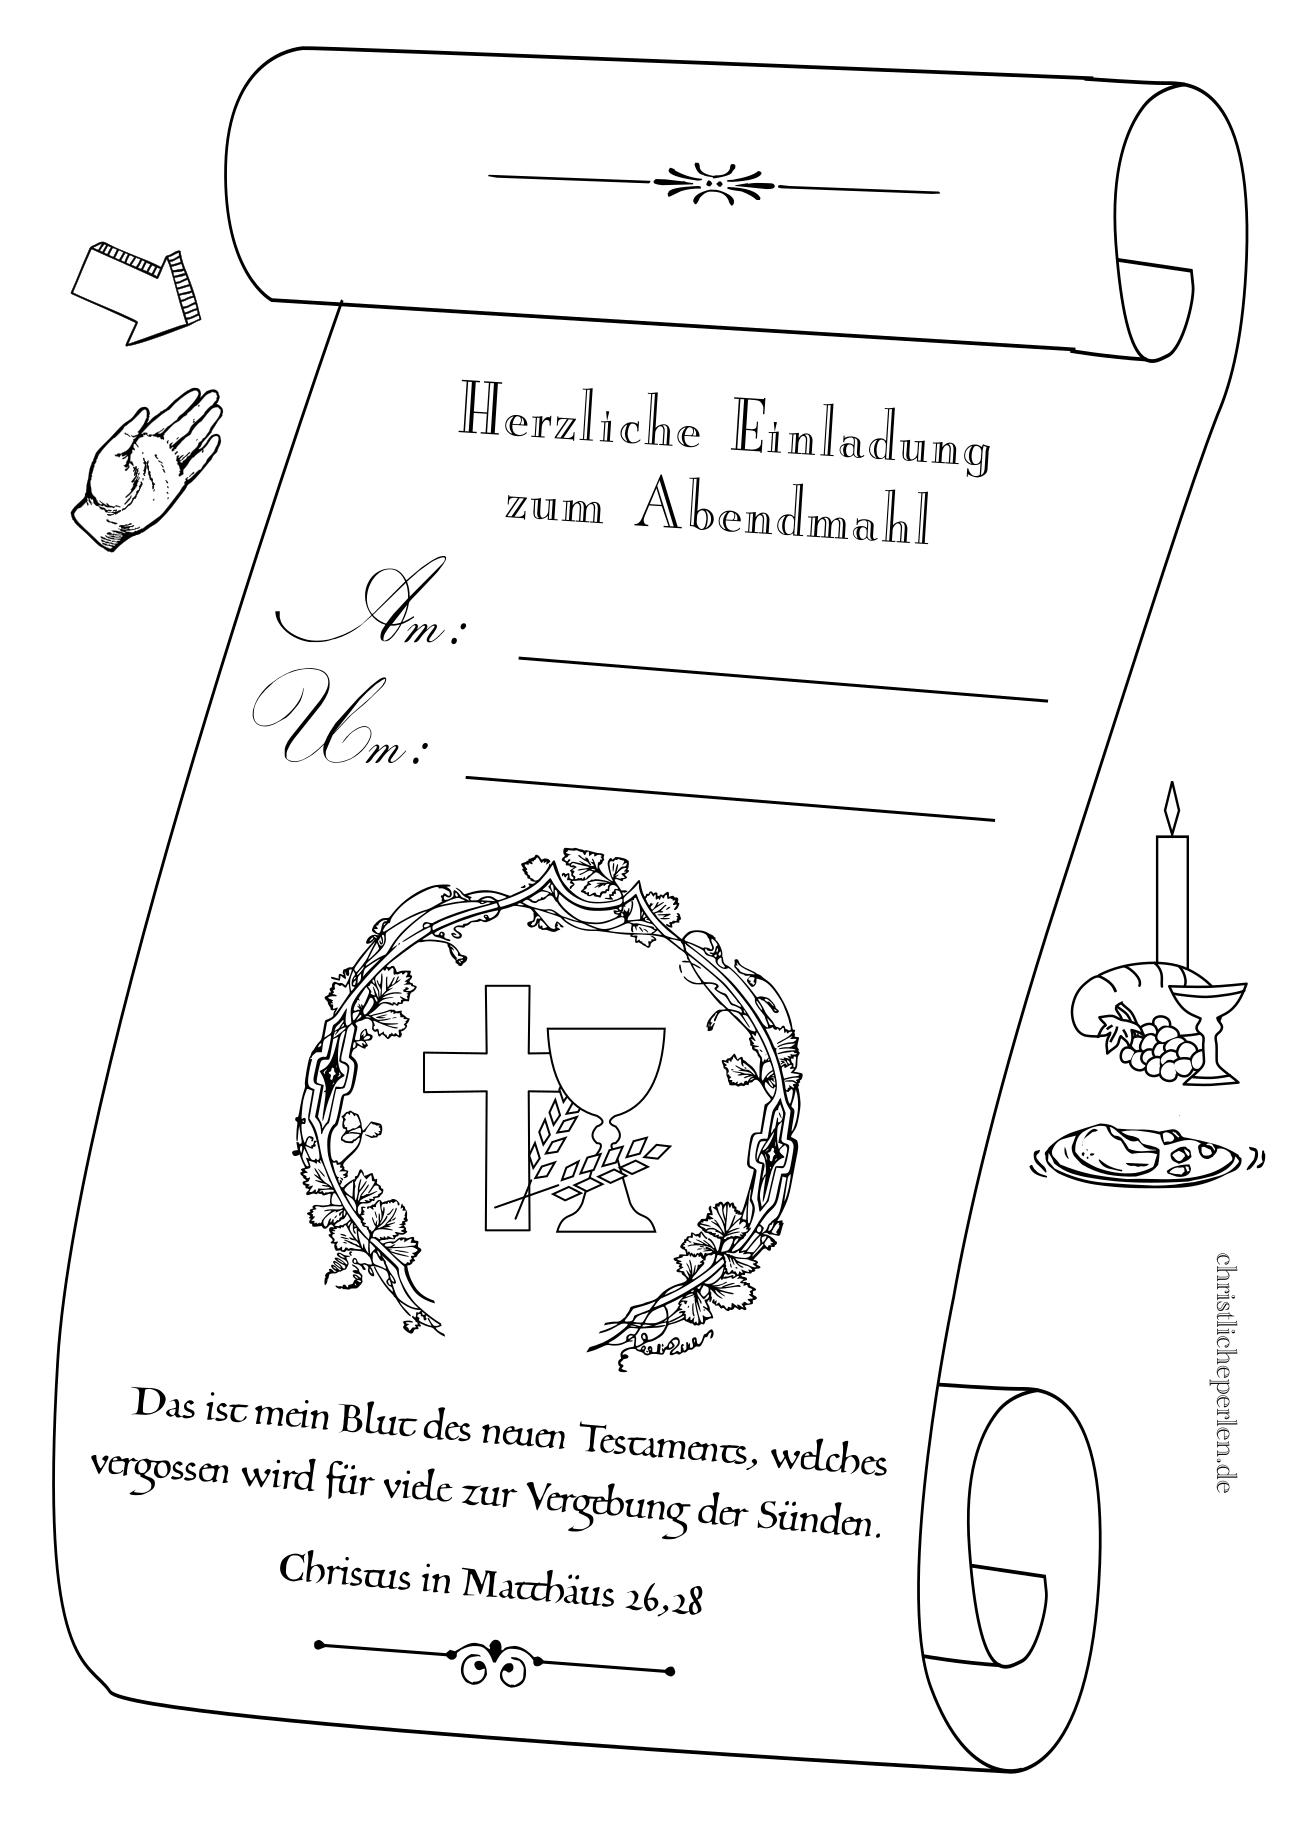 https://christlicheperlen.wordpress.com/2018/09/14/verlobungskarten ...